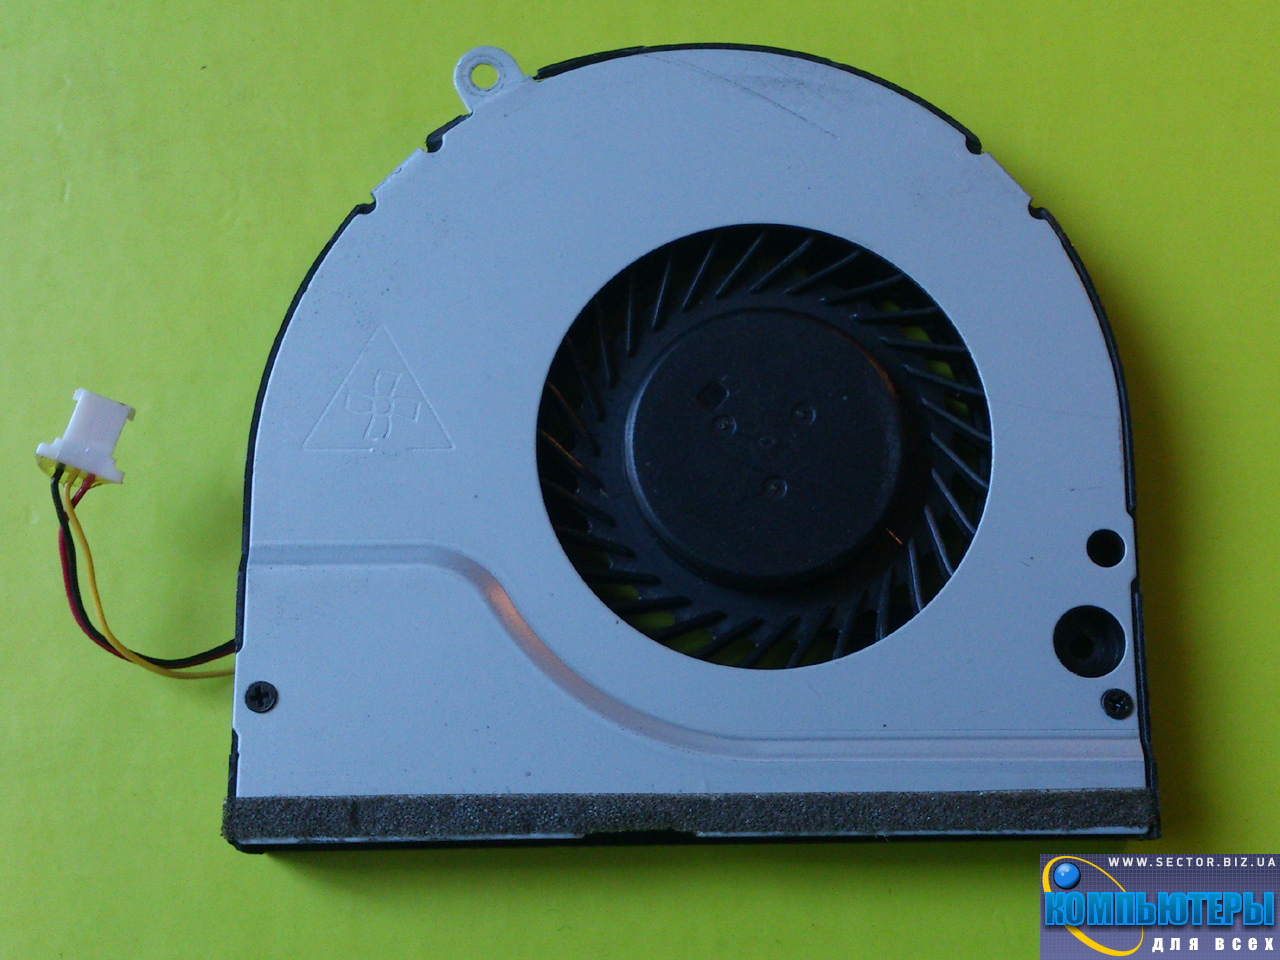 Кулер к ноутбуку Acer Aspire E1-530 E1-530G E1-570 E1-570G p/n: DFS501105FQ0T FFC2. Фото № 2.